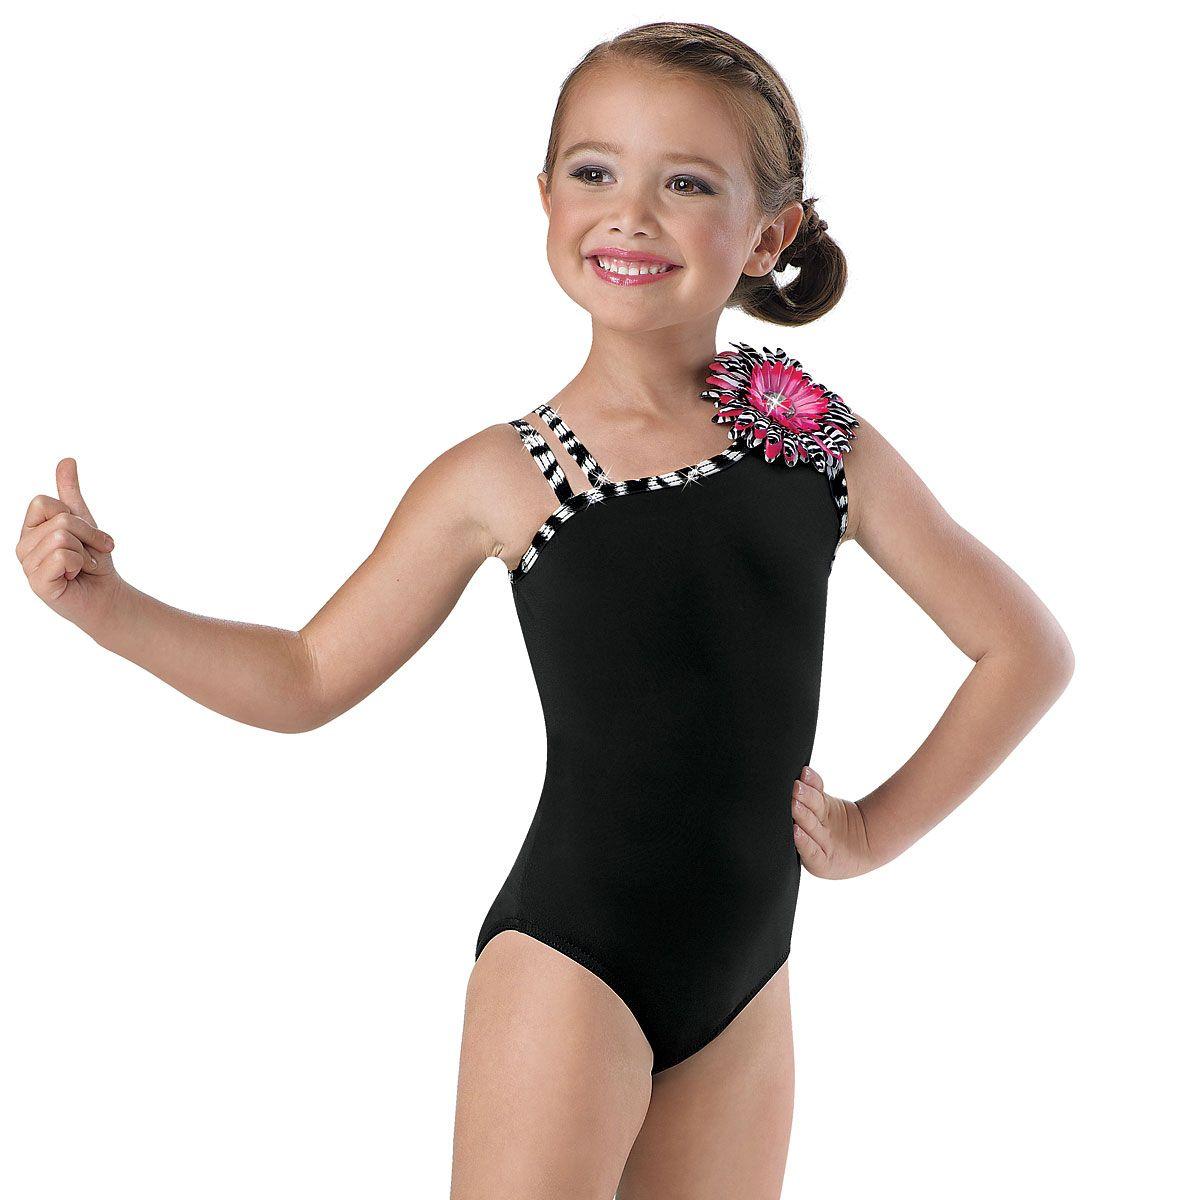 NWT Zebra camisole Leotard dance acro Costuming Girls sizes only matte spandex